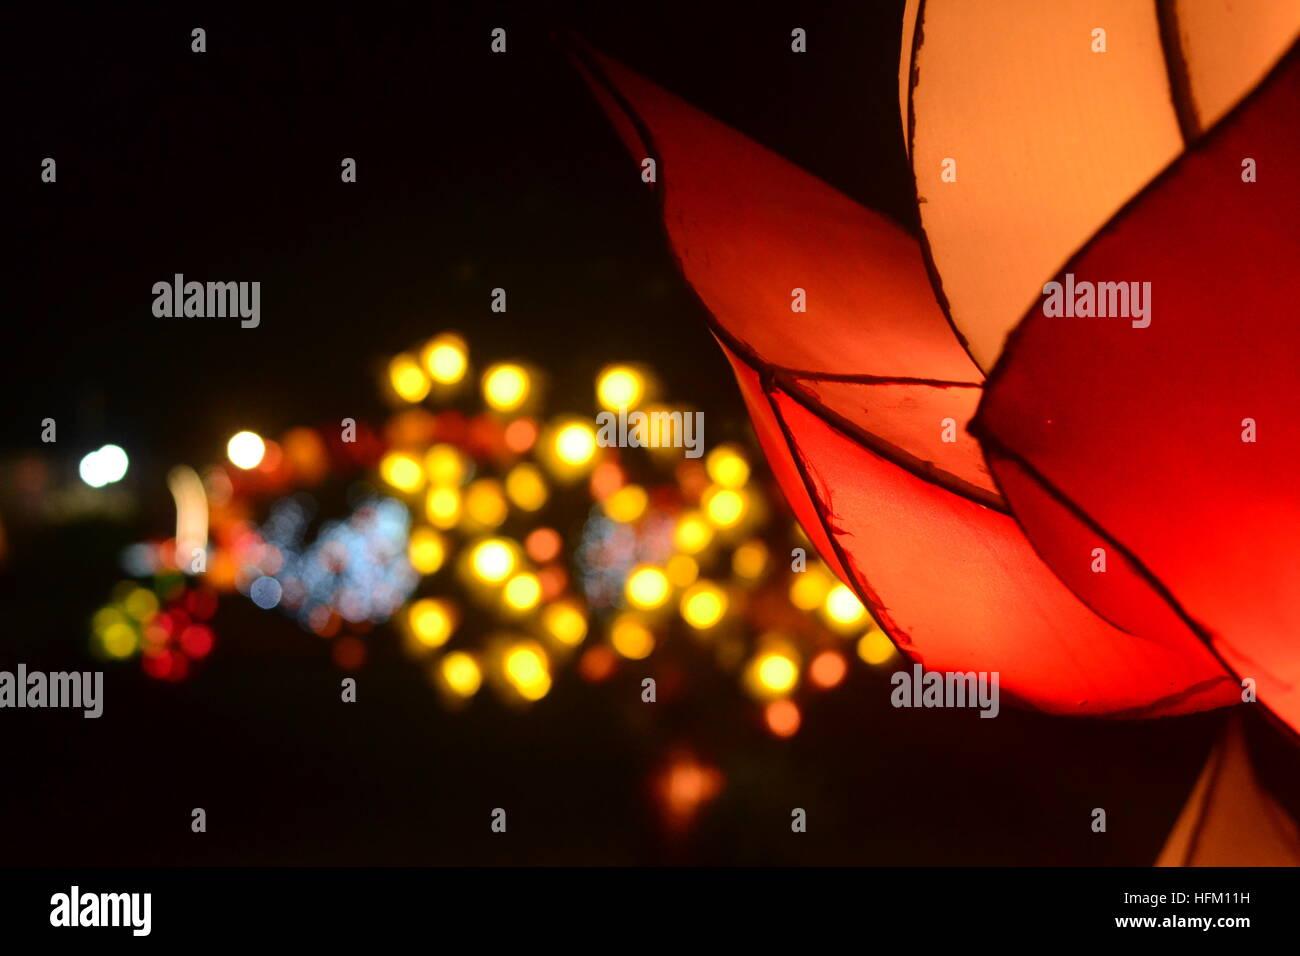 Flower of lights - Stock Image